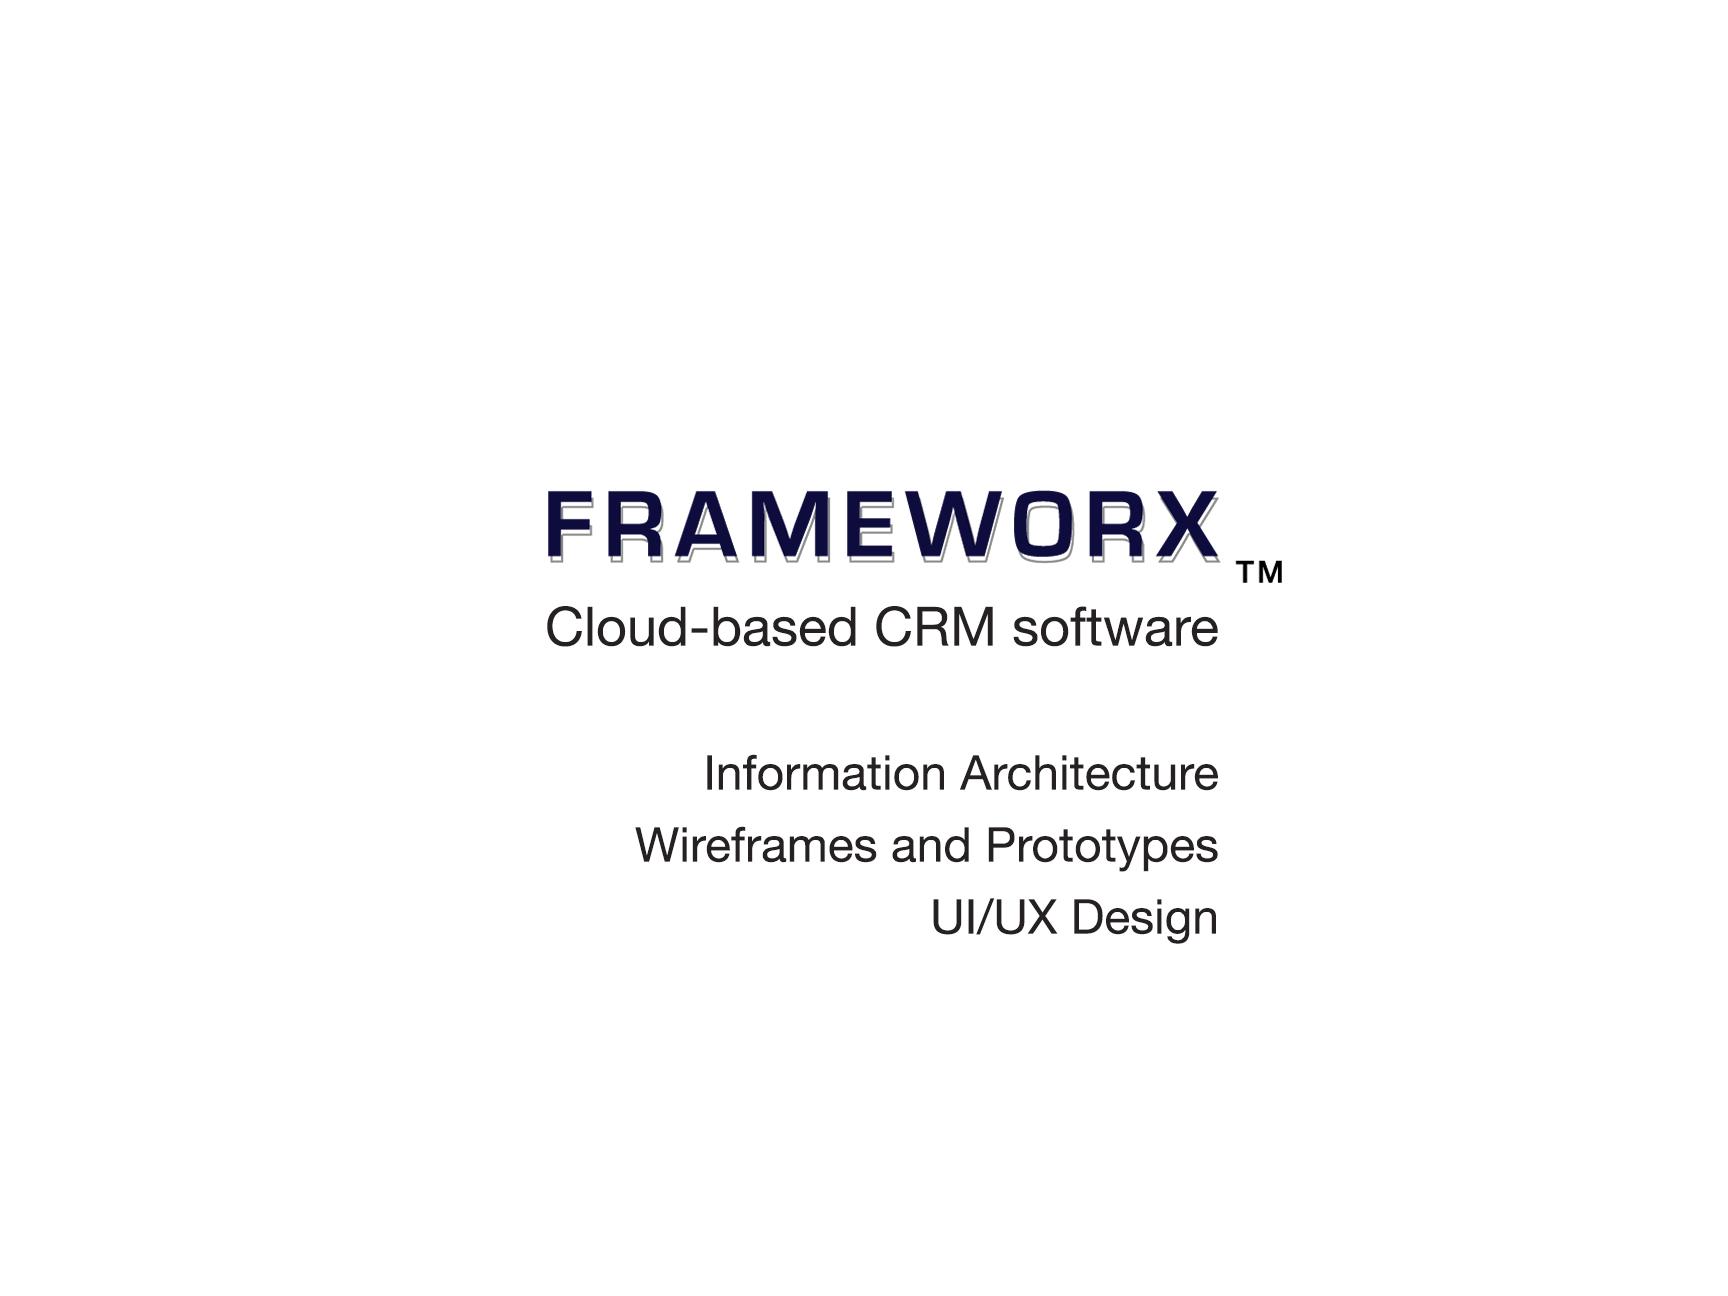 Frameworx_Promo_Text.jpg